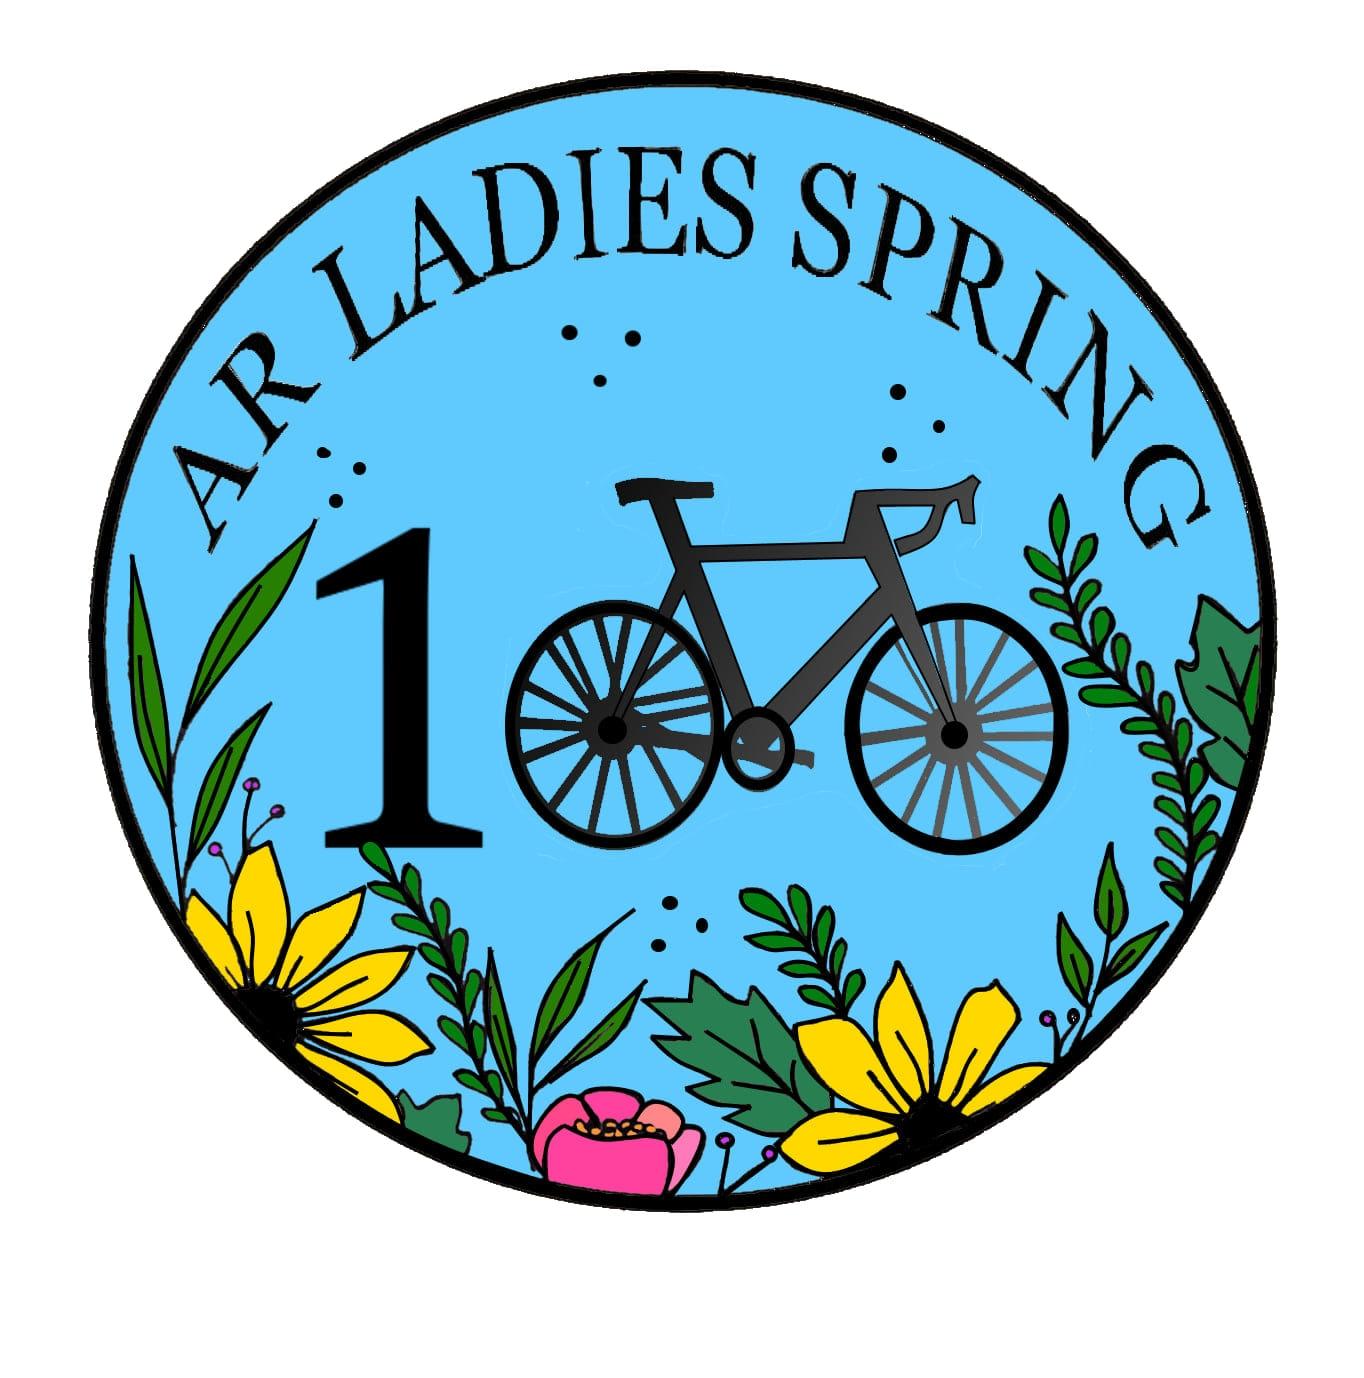 AR Ladies Spring Century and link